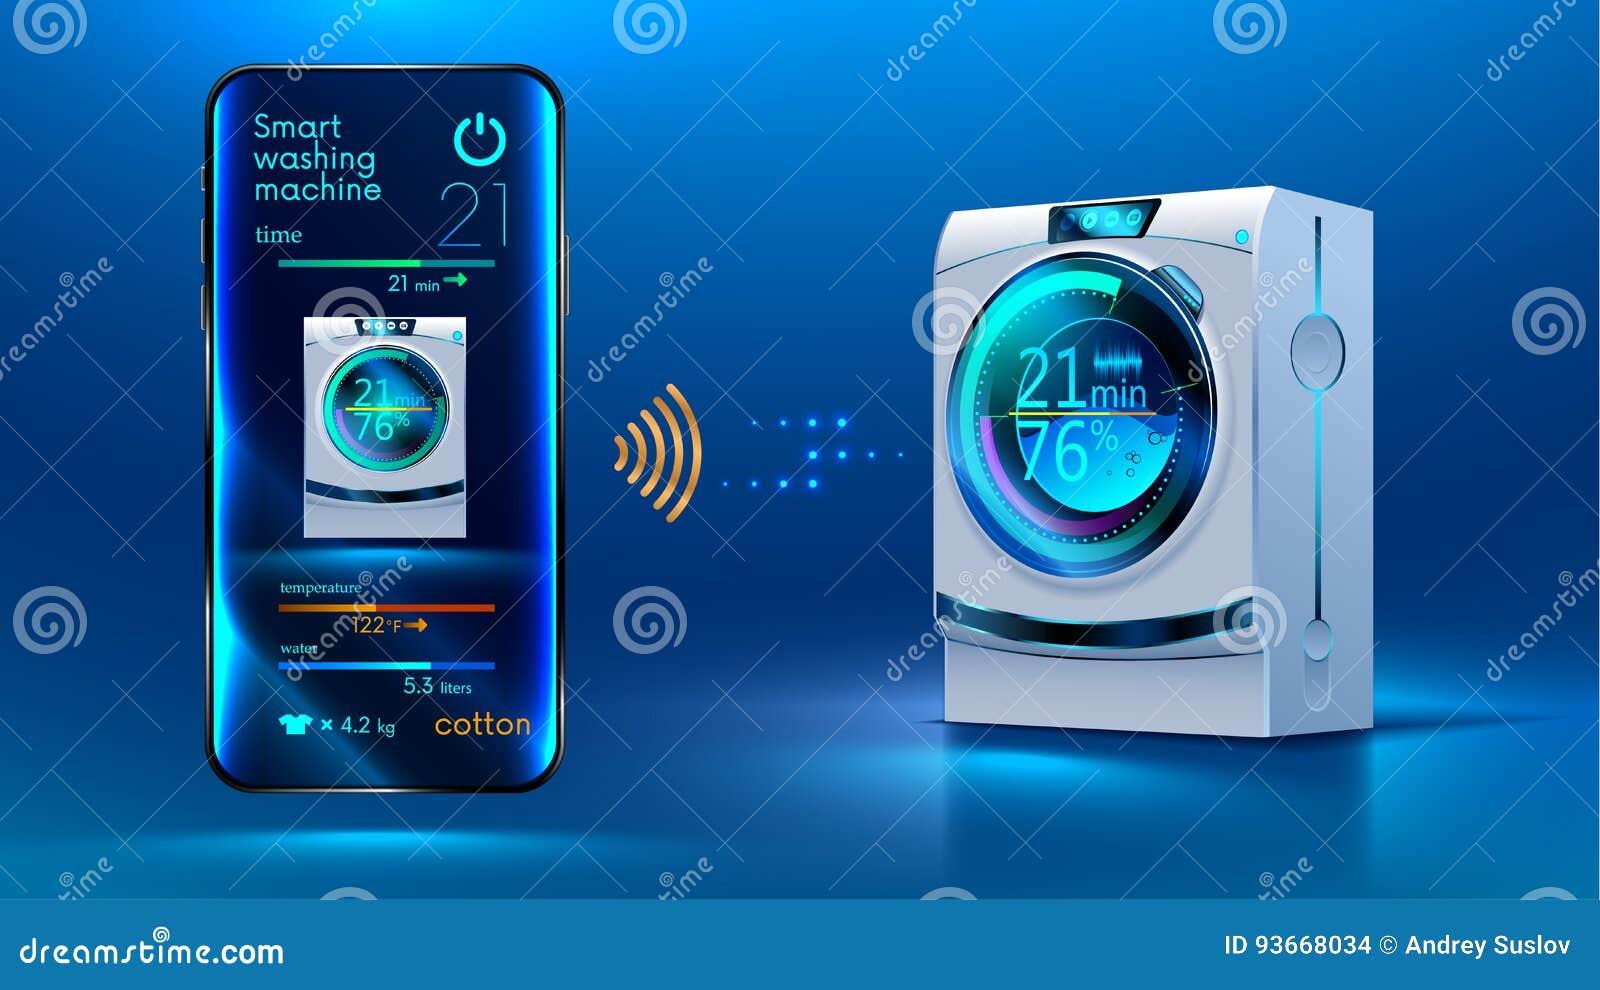 smart washing machine stock vector illustration of house 93668034. Black Bedroom Furniture Sets. Home Design Ideas